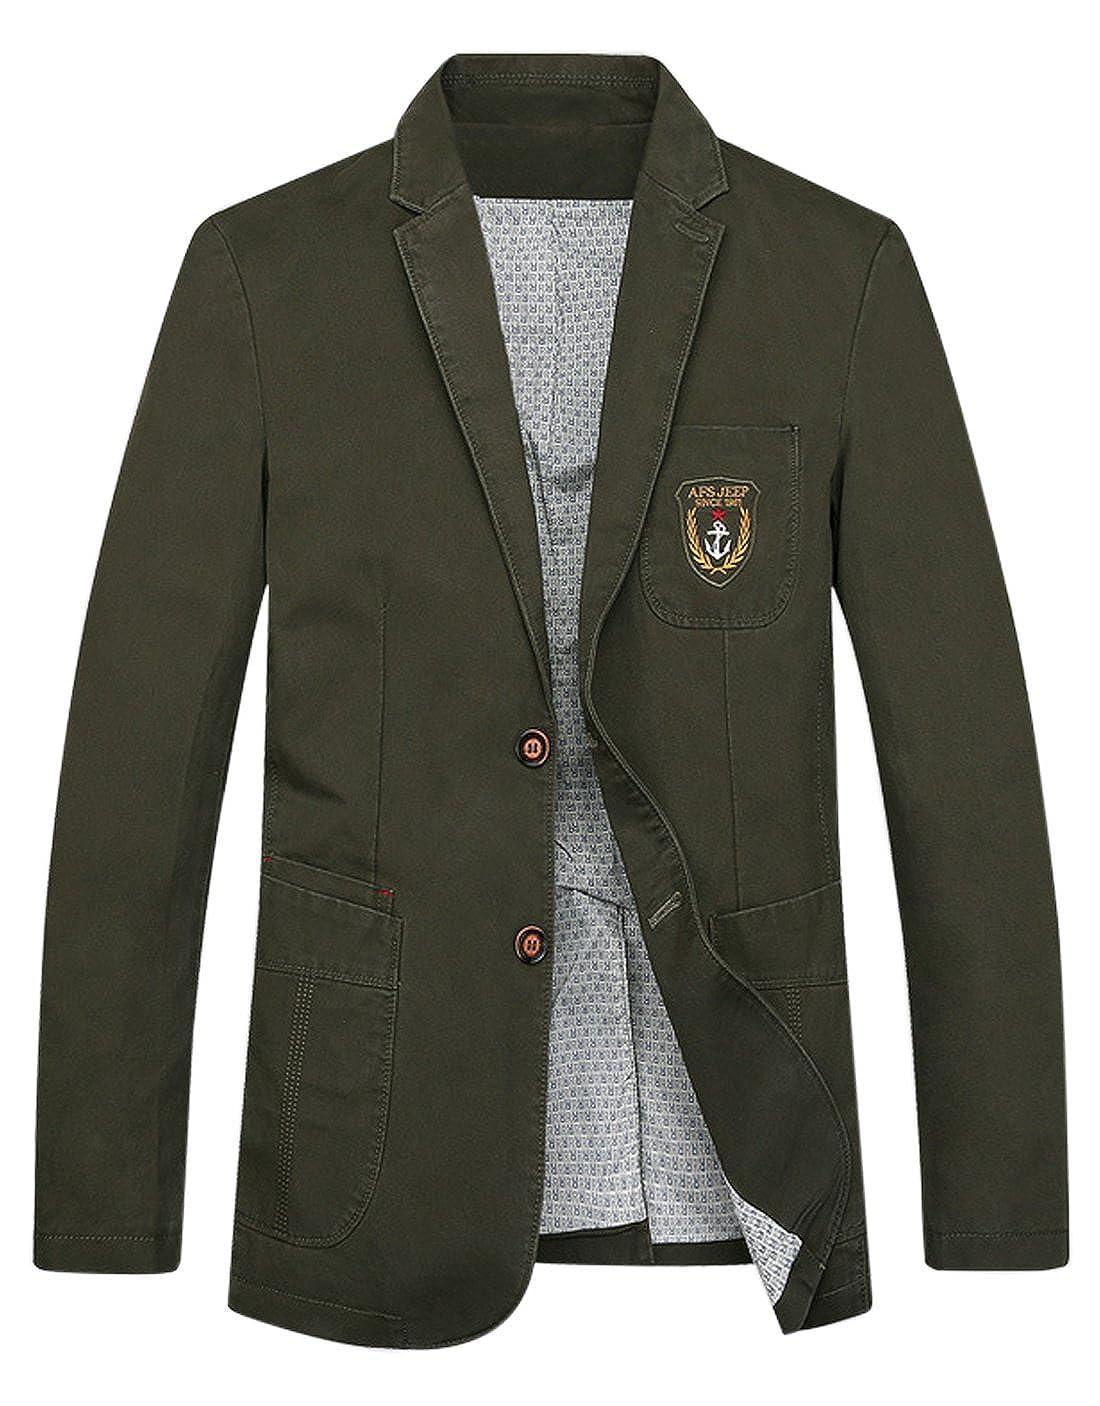 Gihuo Mens Casual Slim Fit Suit Blazer Sport Jacket